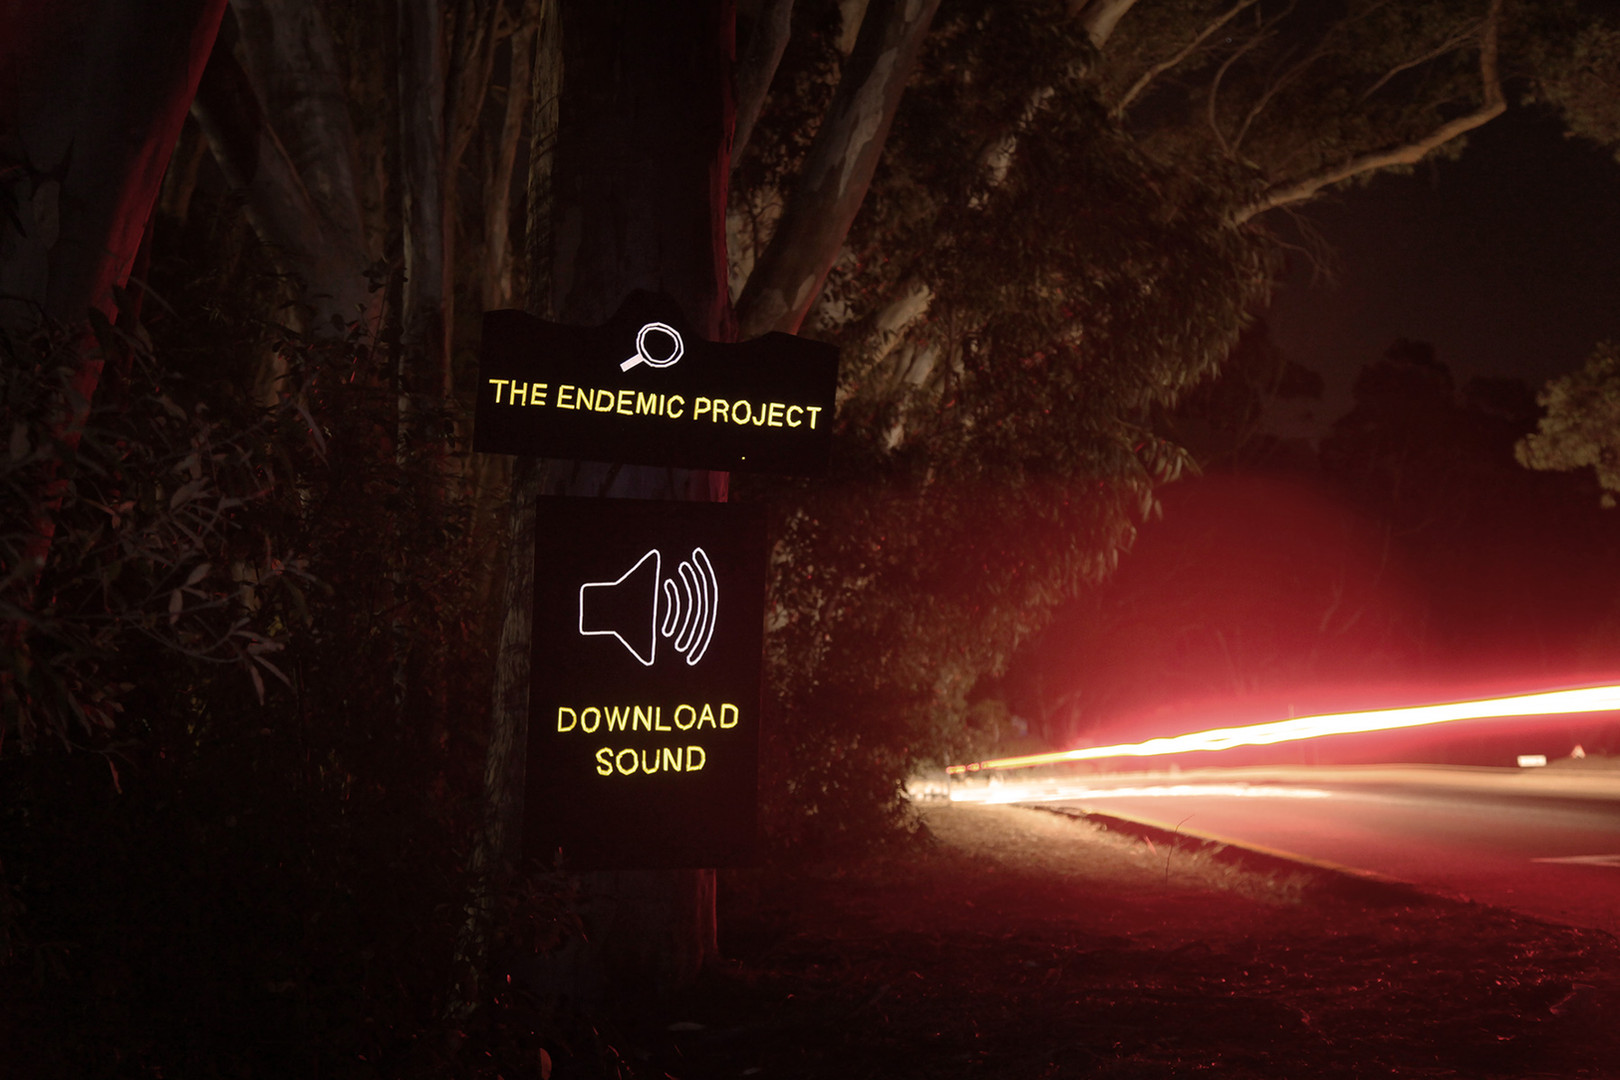 Download sound sign